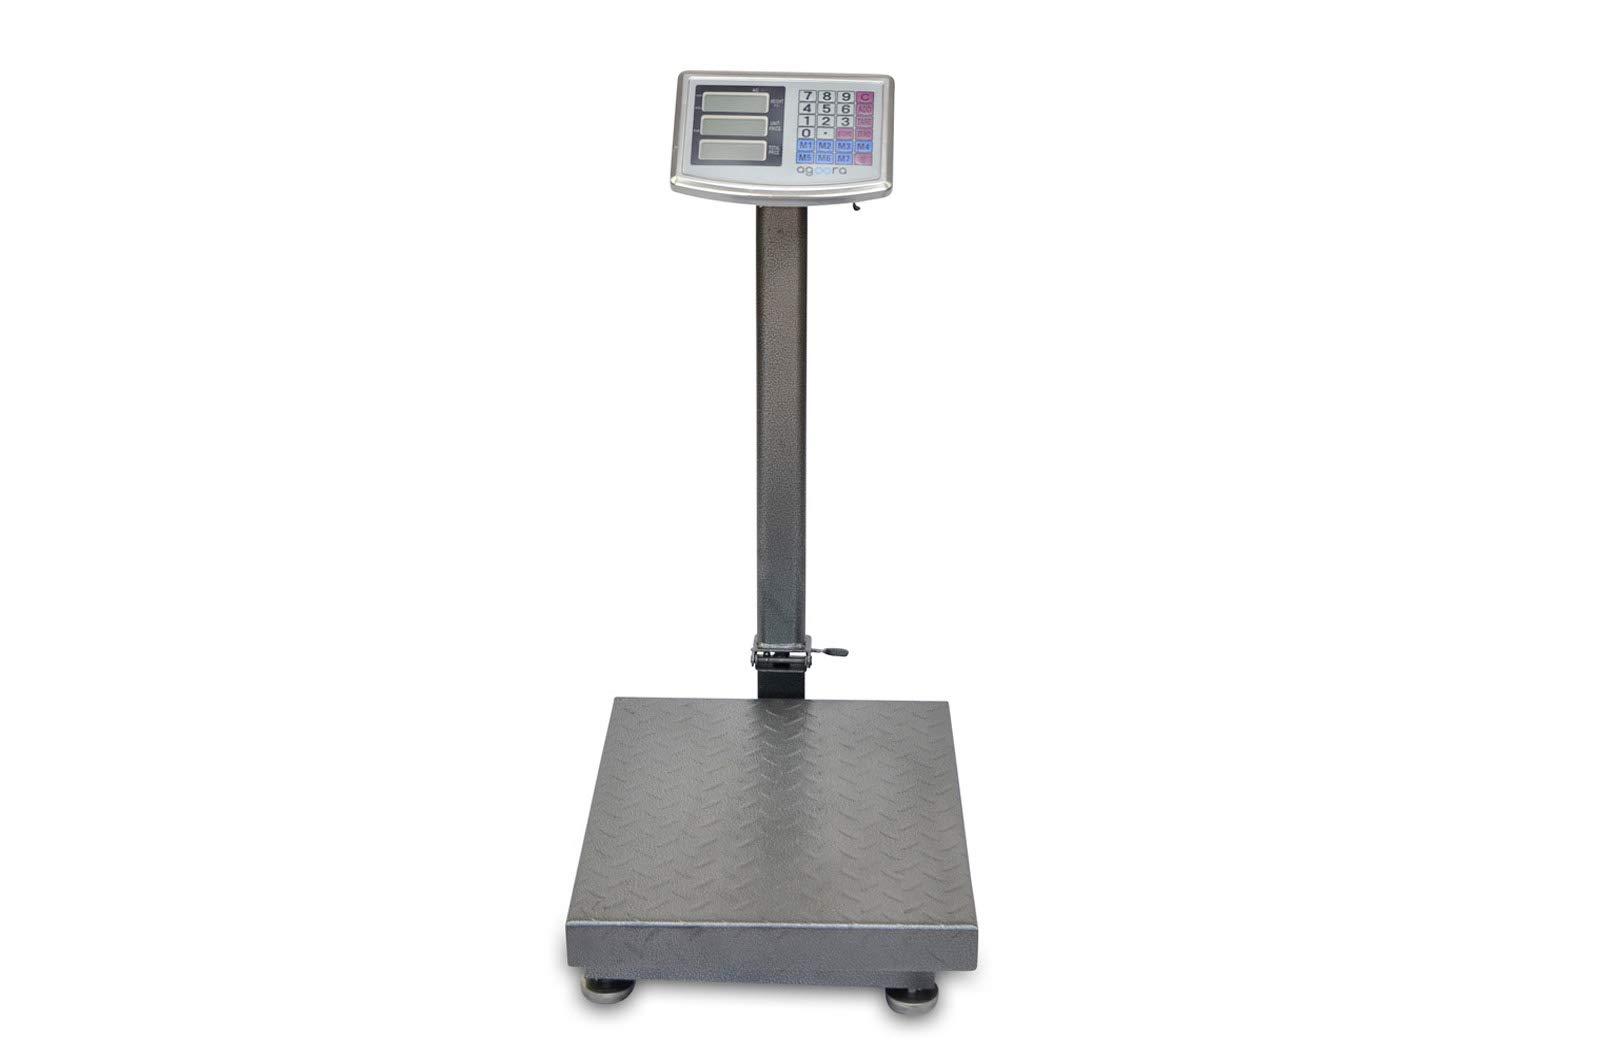 Bascula Industrial de Plataforma 40x50Cm Balanza Digital Reforzada 300Kg product image